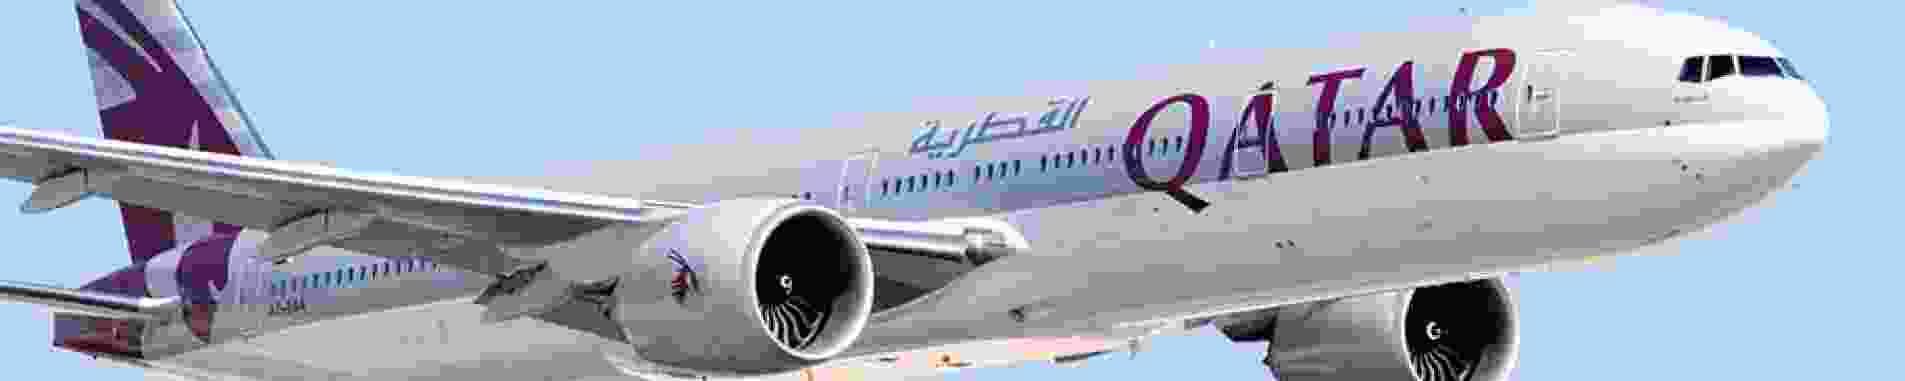 Travel Services header image